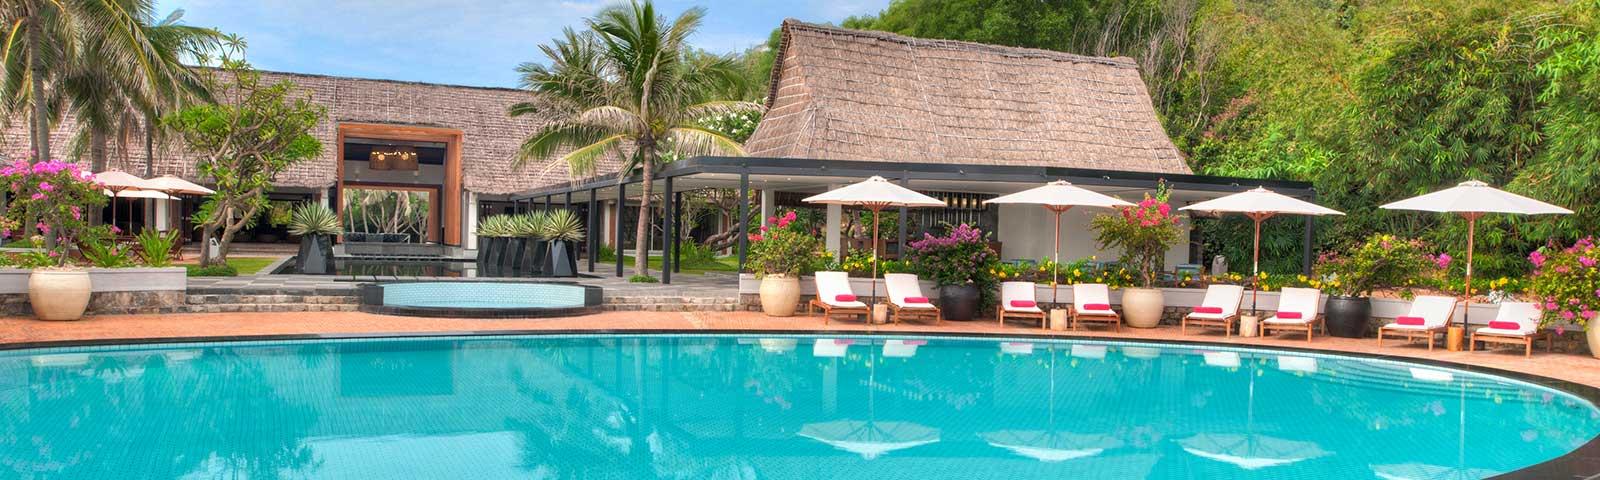 Enjoy stays at AVANI Quy Nhon with best Quy Nhon Hotel Deals